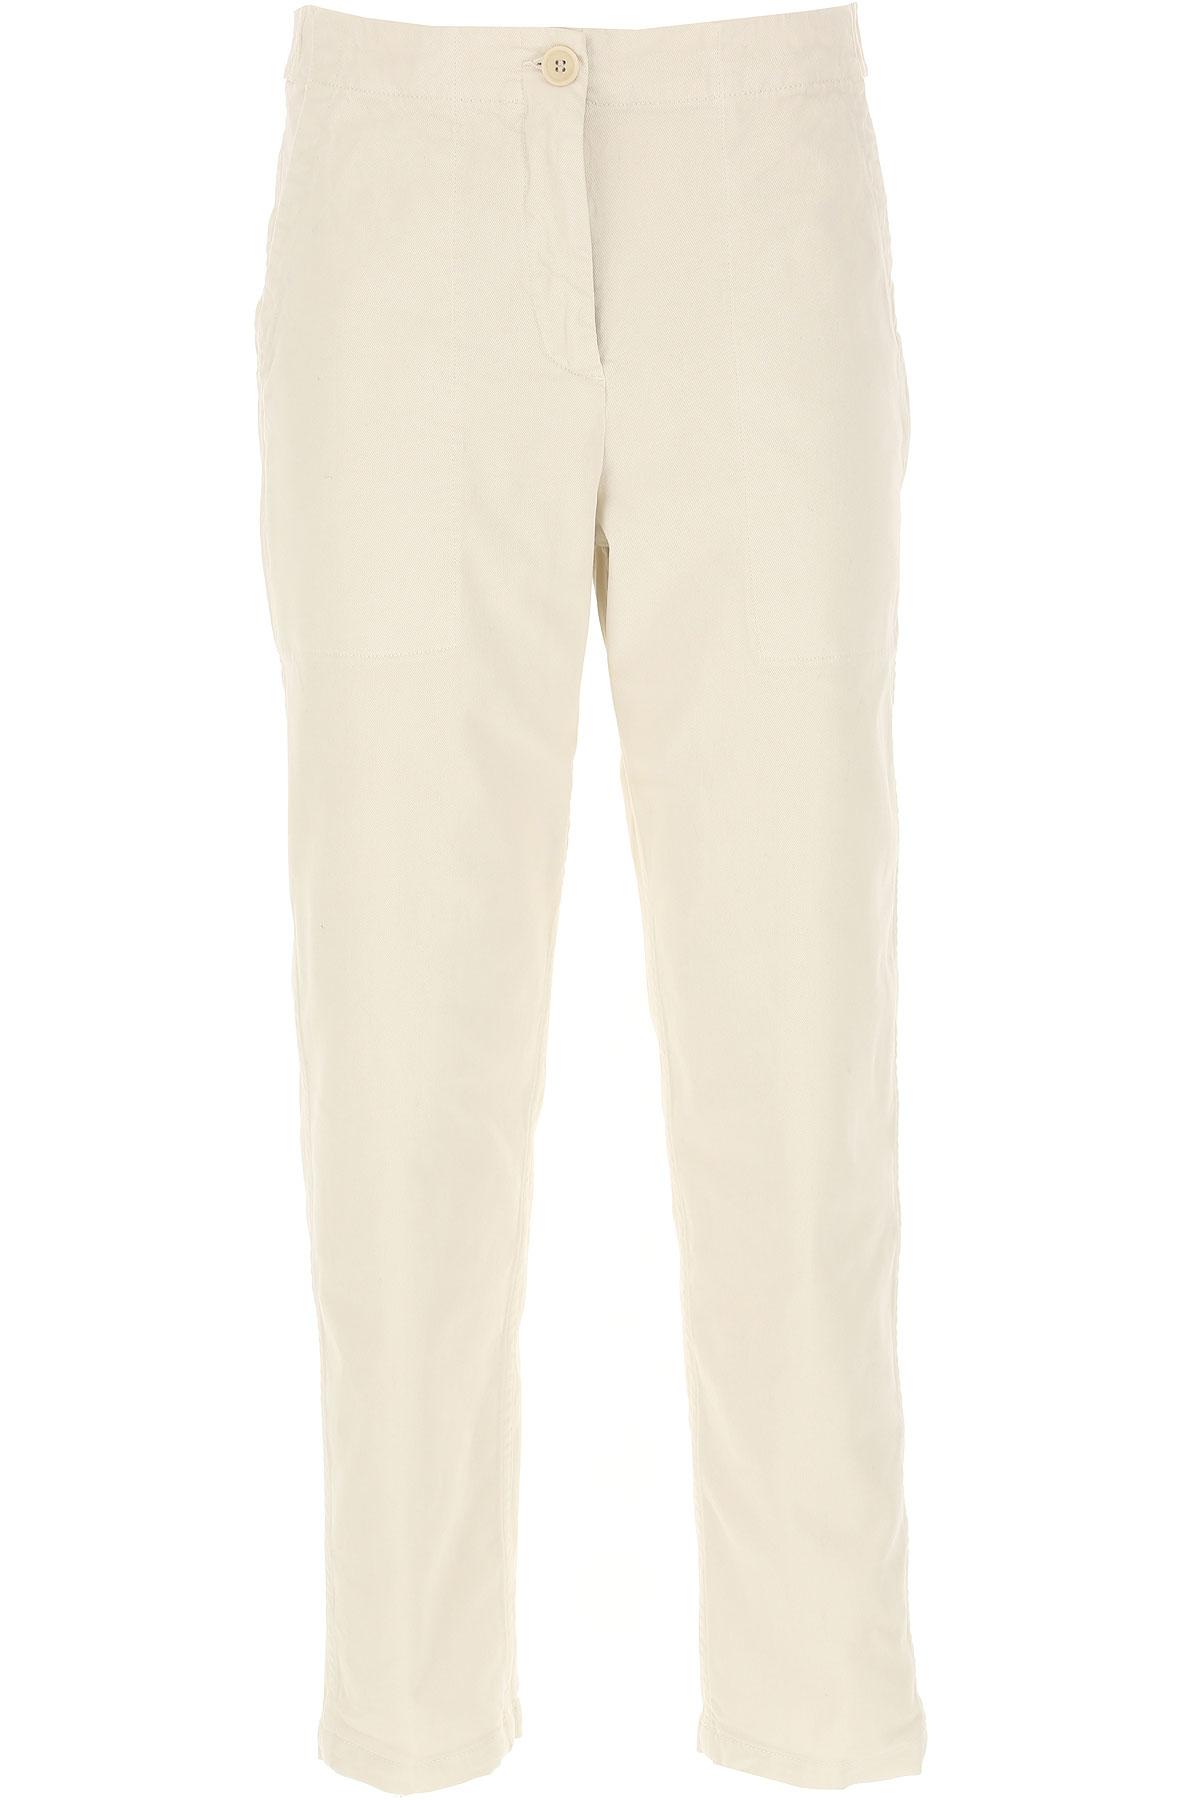 Aspesi Pants for Women On Sale, Cream, Cotton, 2019, 26 30